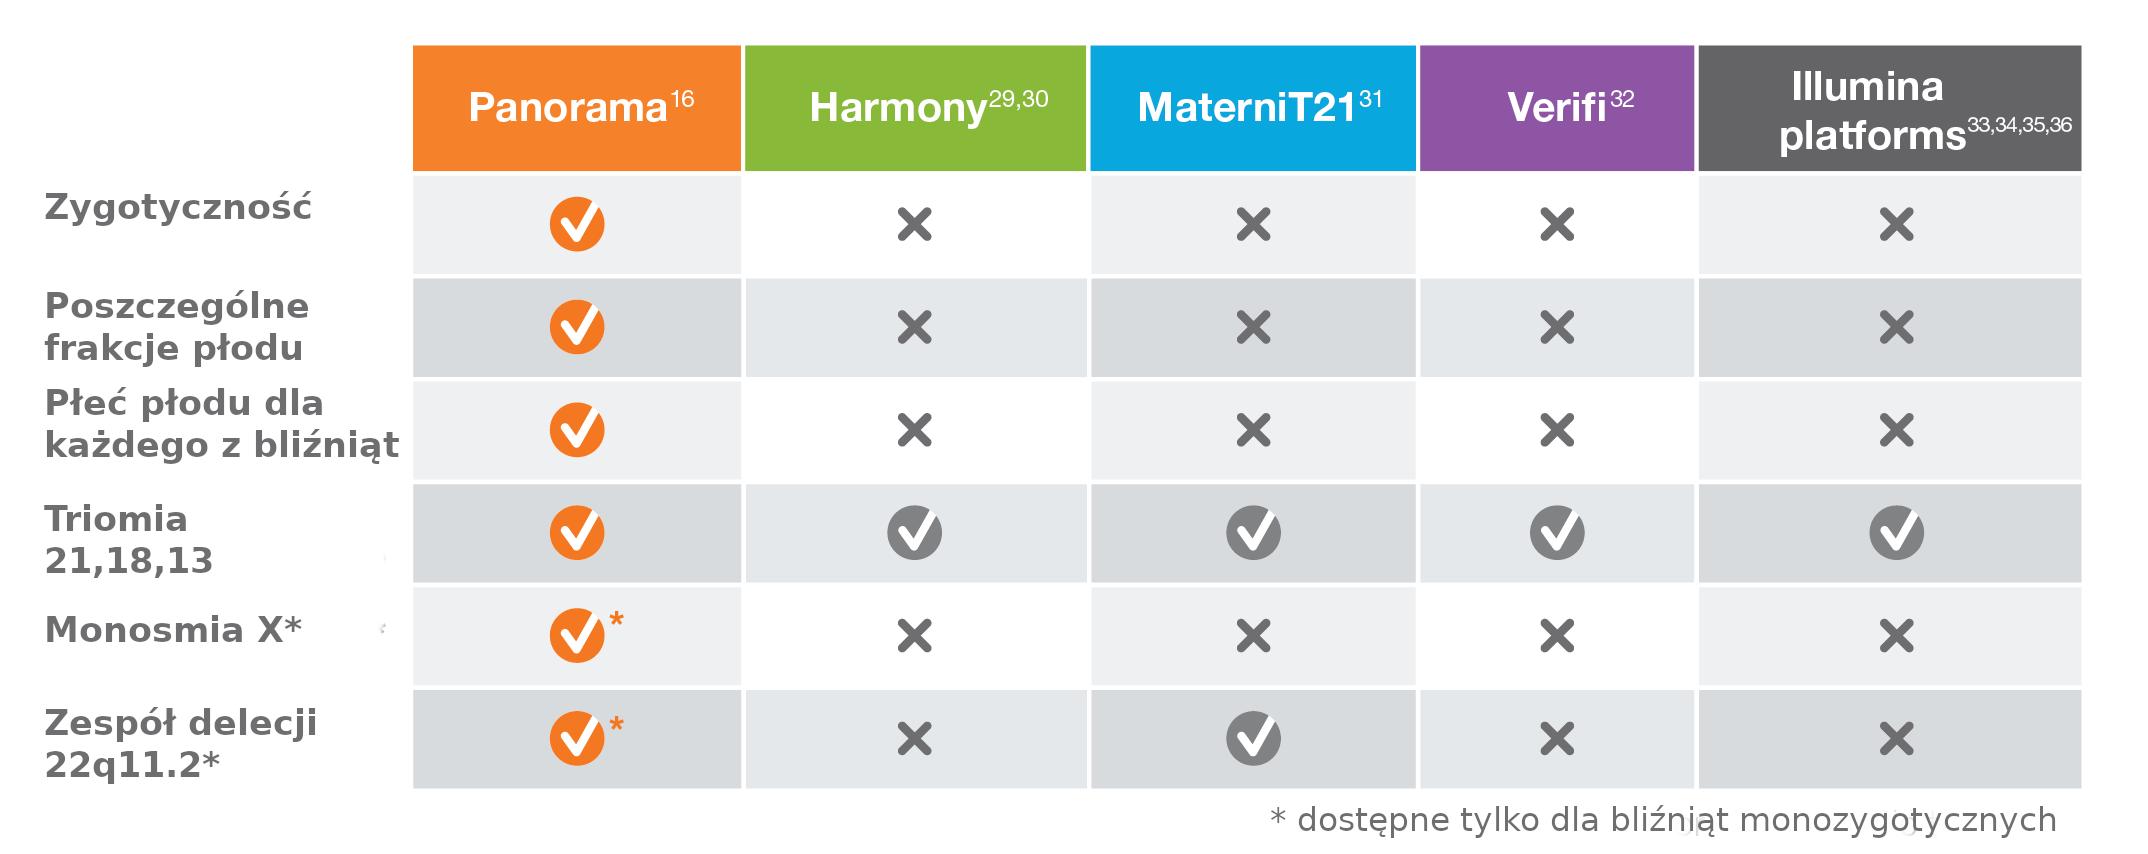 panorama test prenatalny porównanie z innymi testami